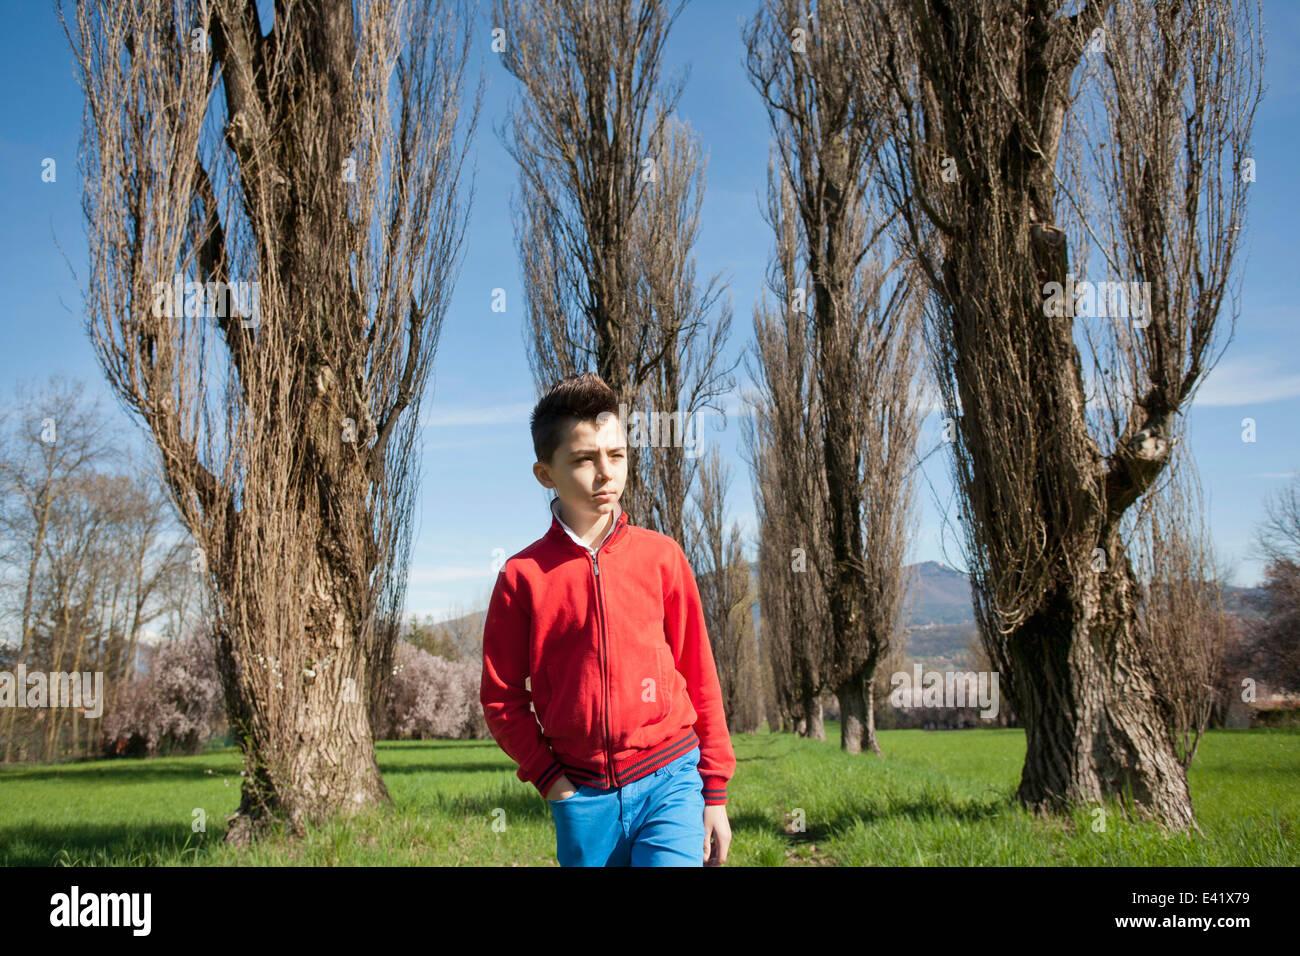 Twelve year old boy strolling along tree lined field - Stock Image